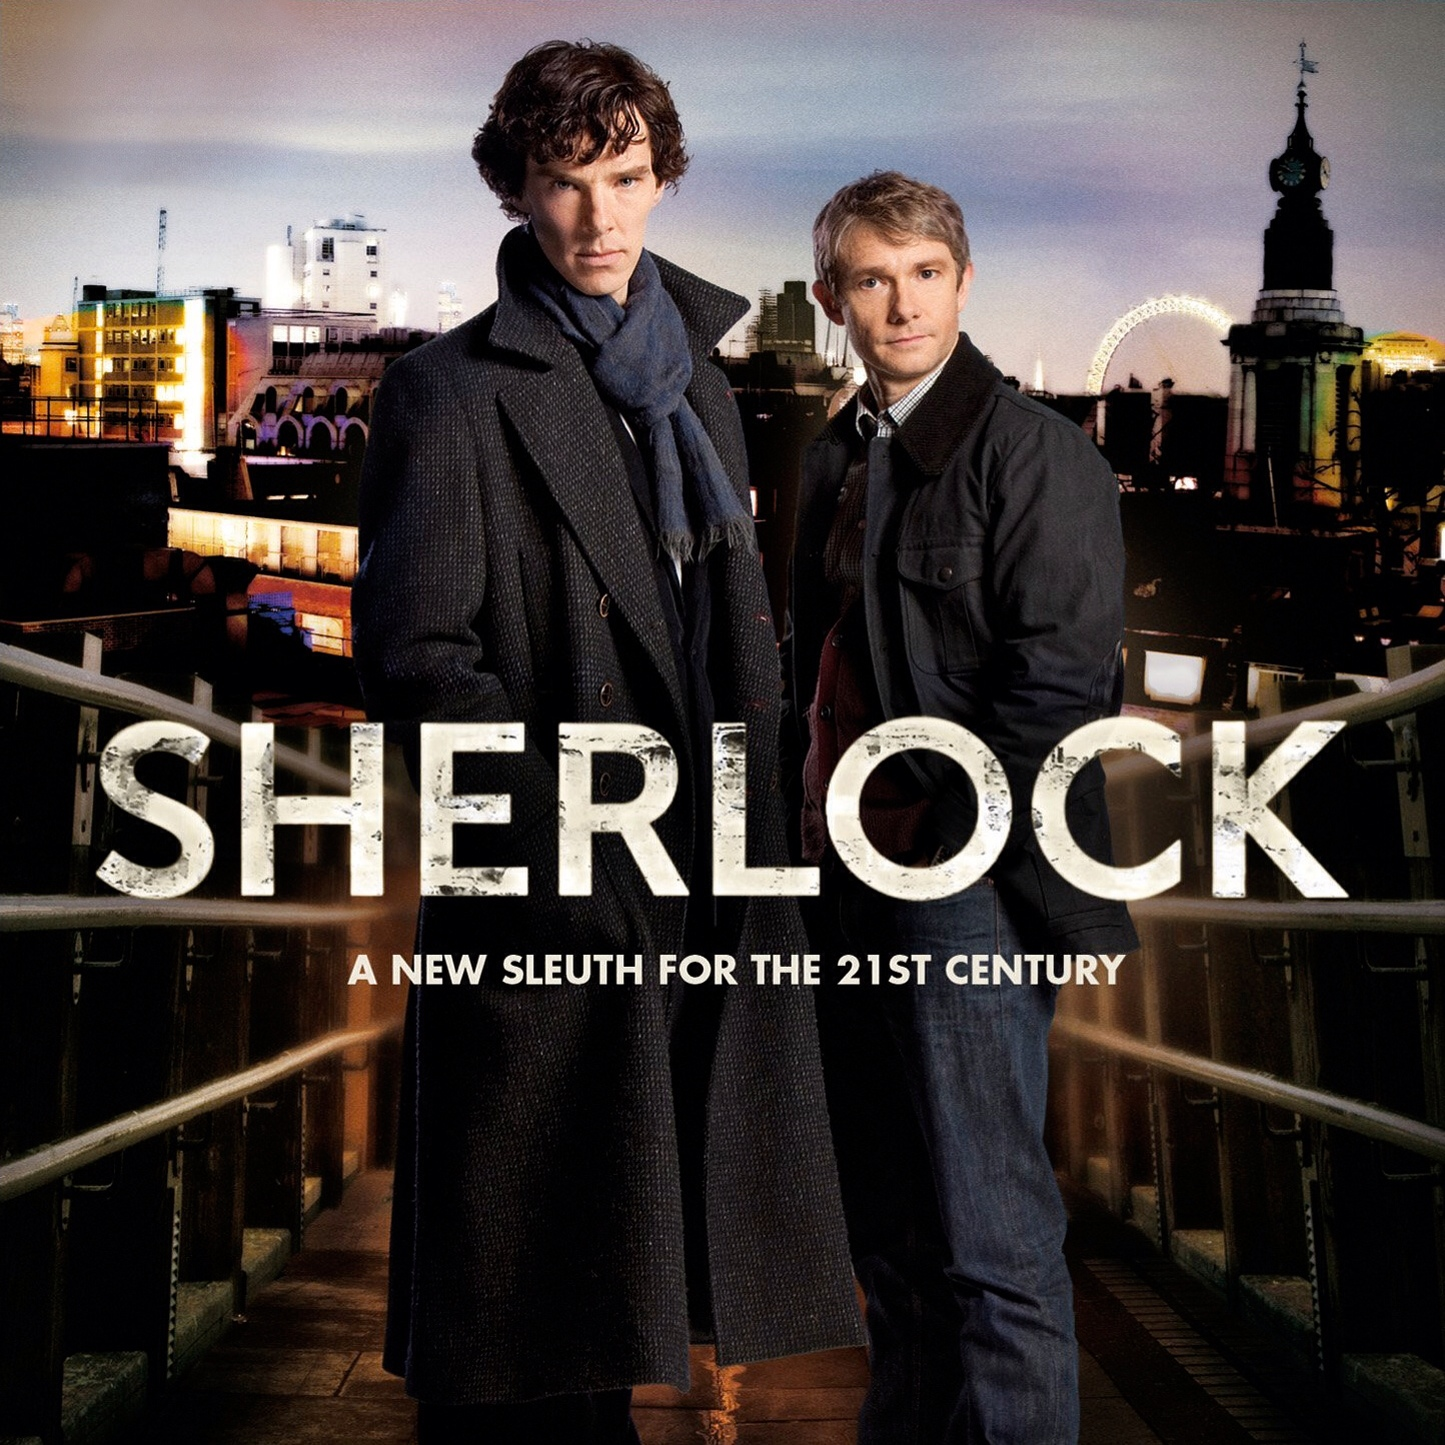 Sherlock holmes 2017 tv series season 1 subtitles